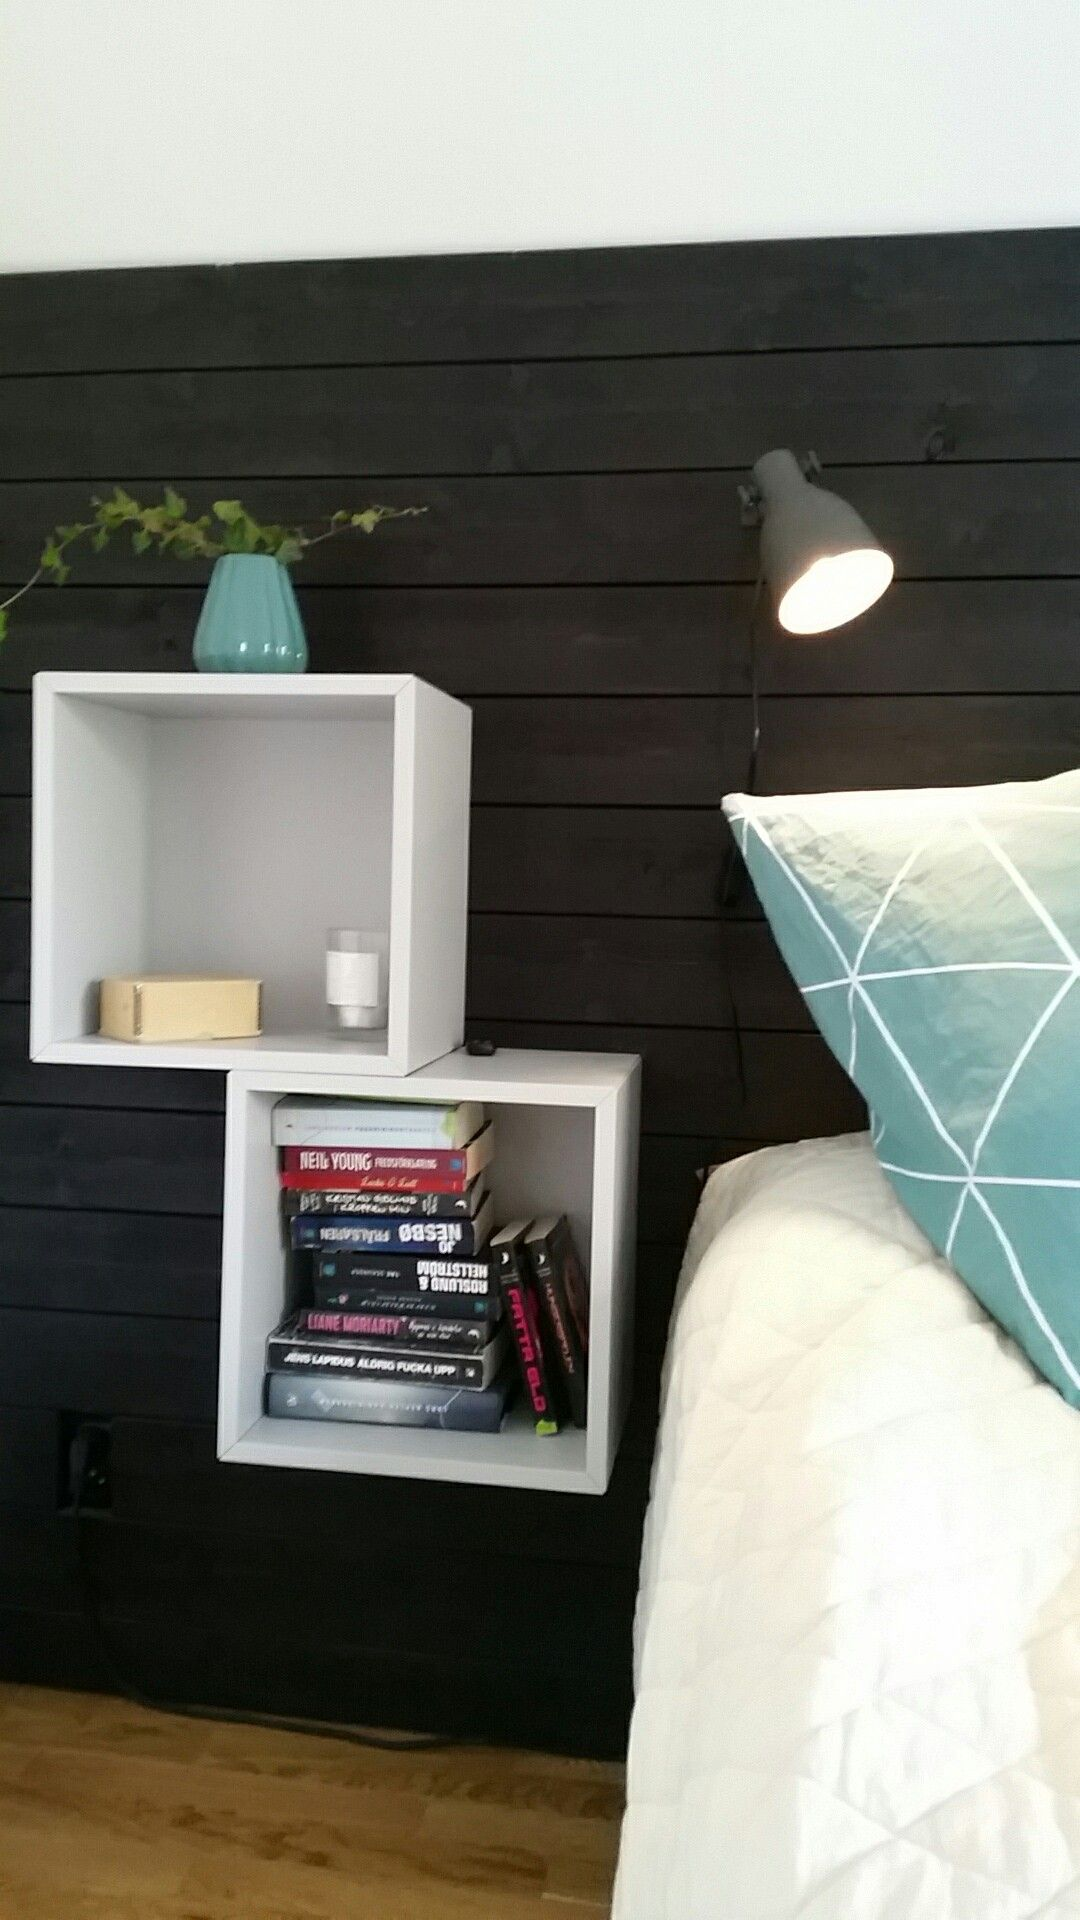 eket ikea nattduksbord inredning pinterest nattduksbord och ikea. Black Bedroom Furniture Sets. Home Design Ideas